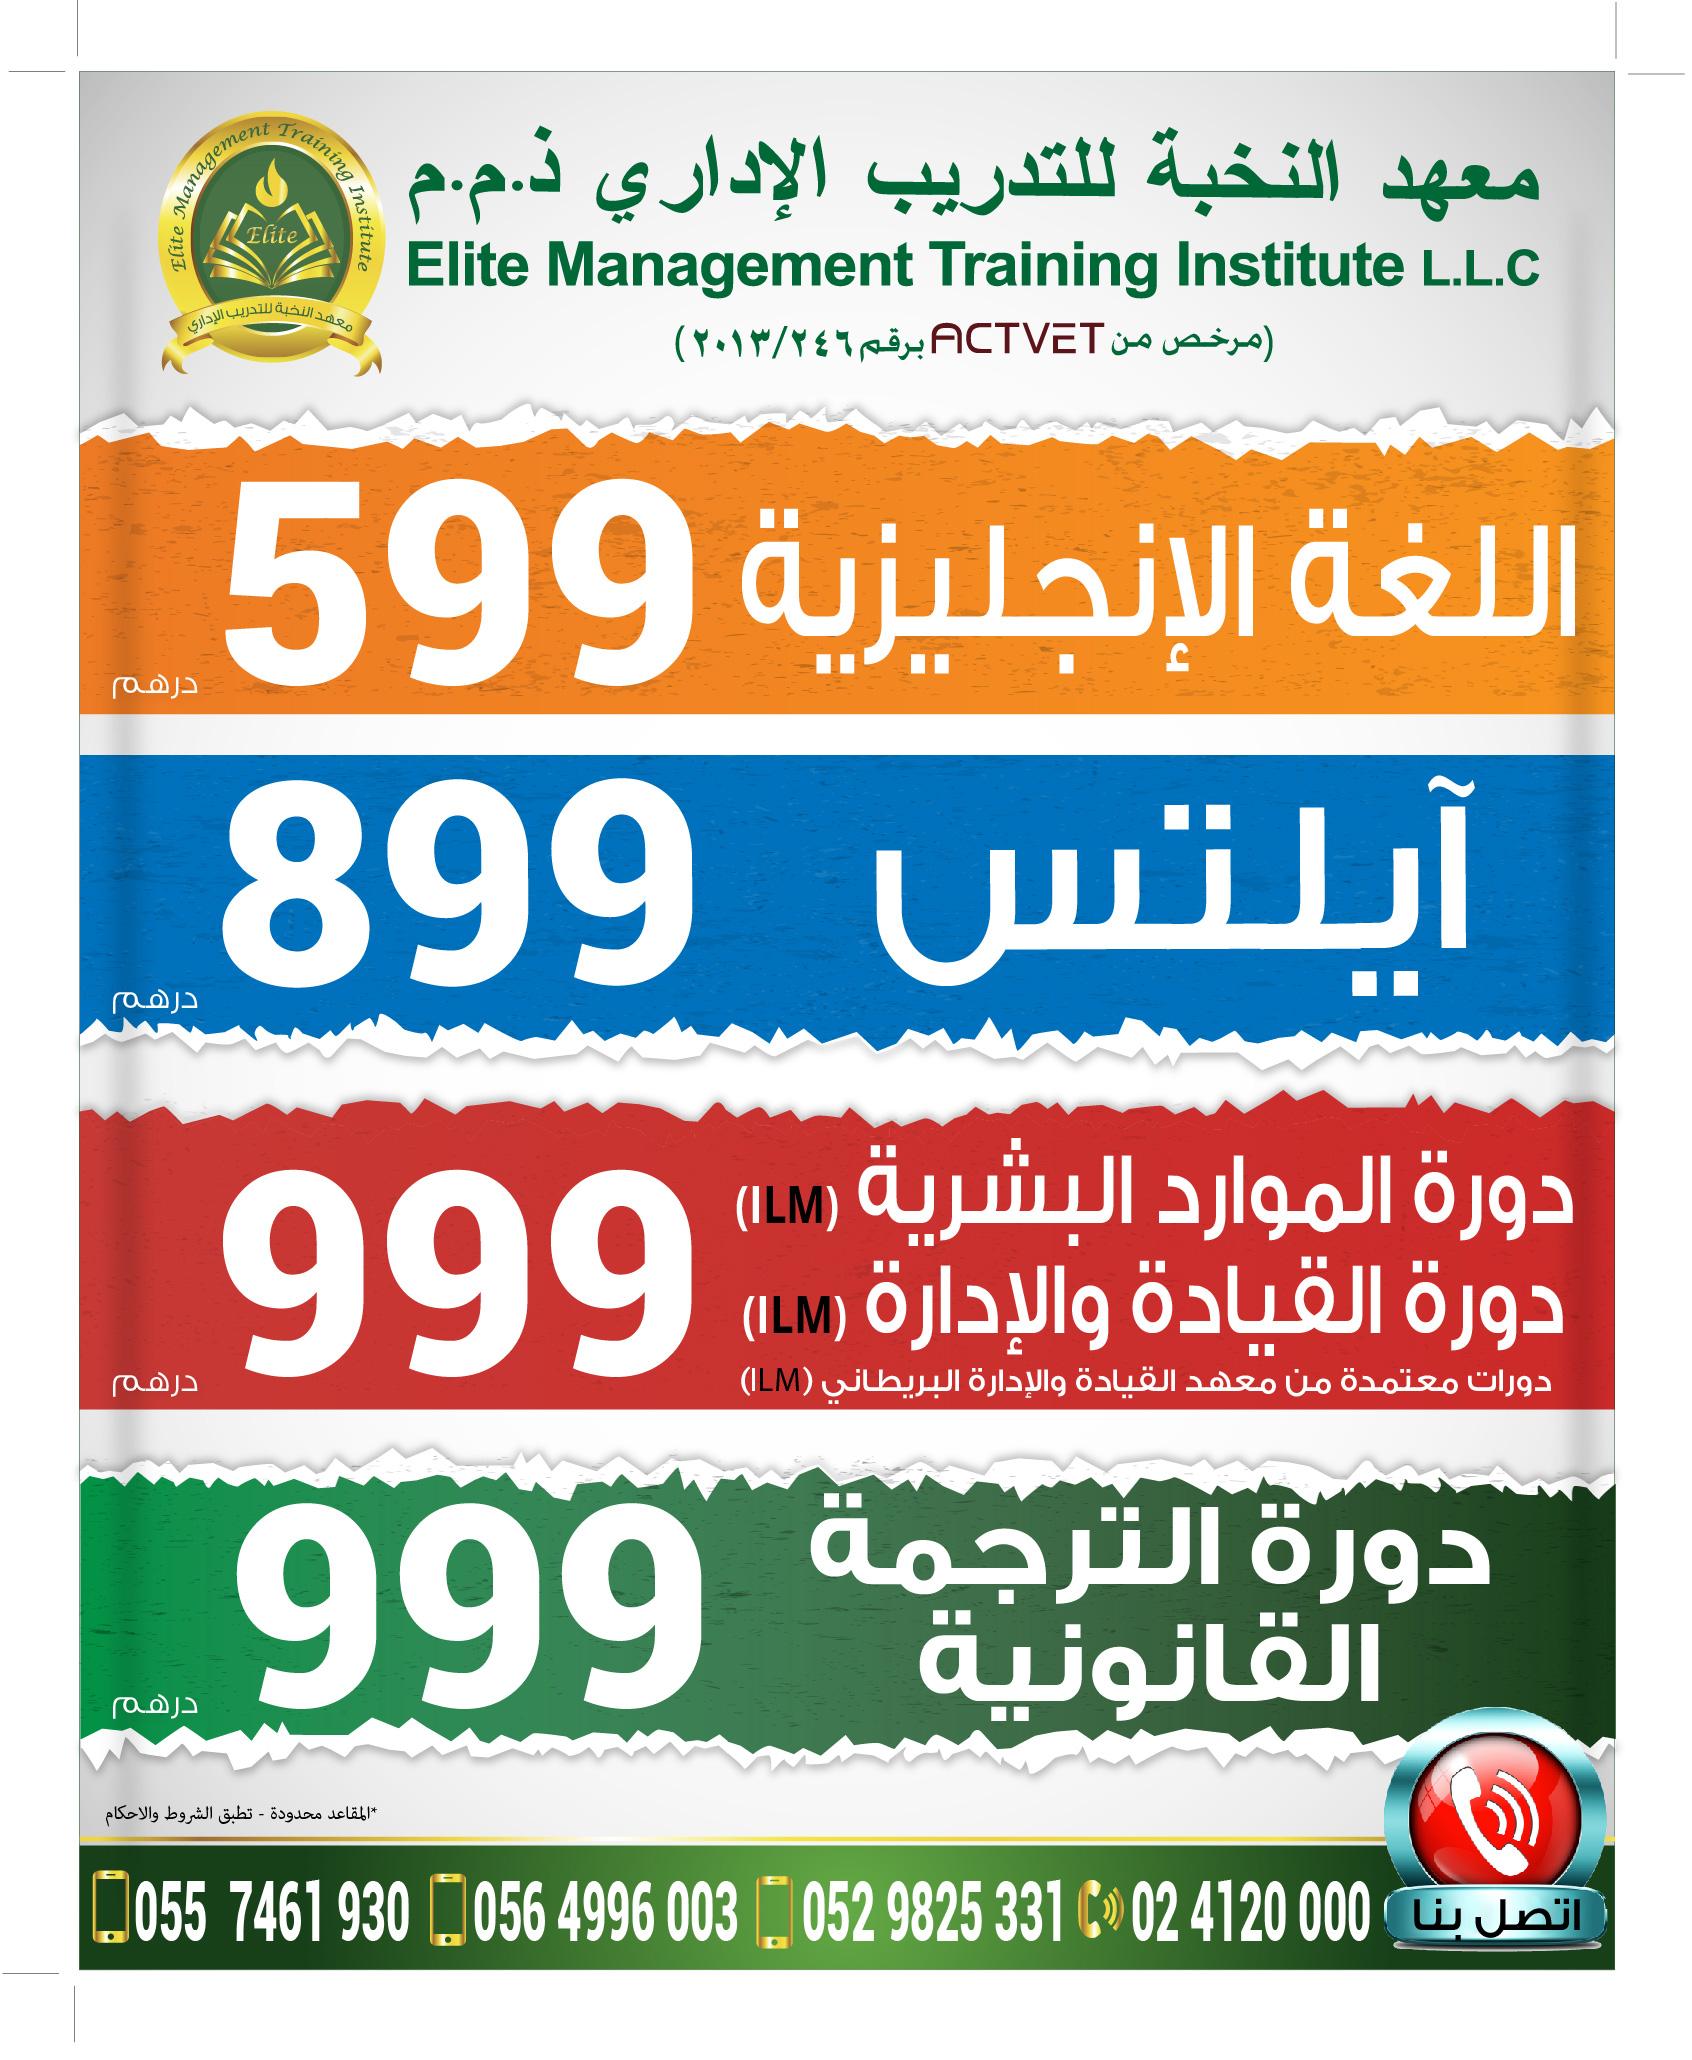 emti-alwaseet-12-21-2016-01